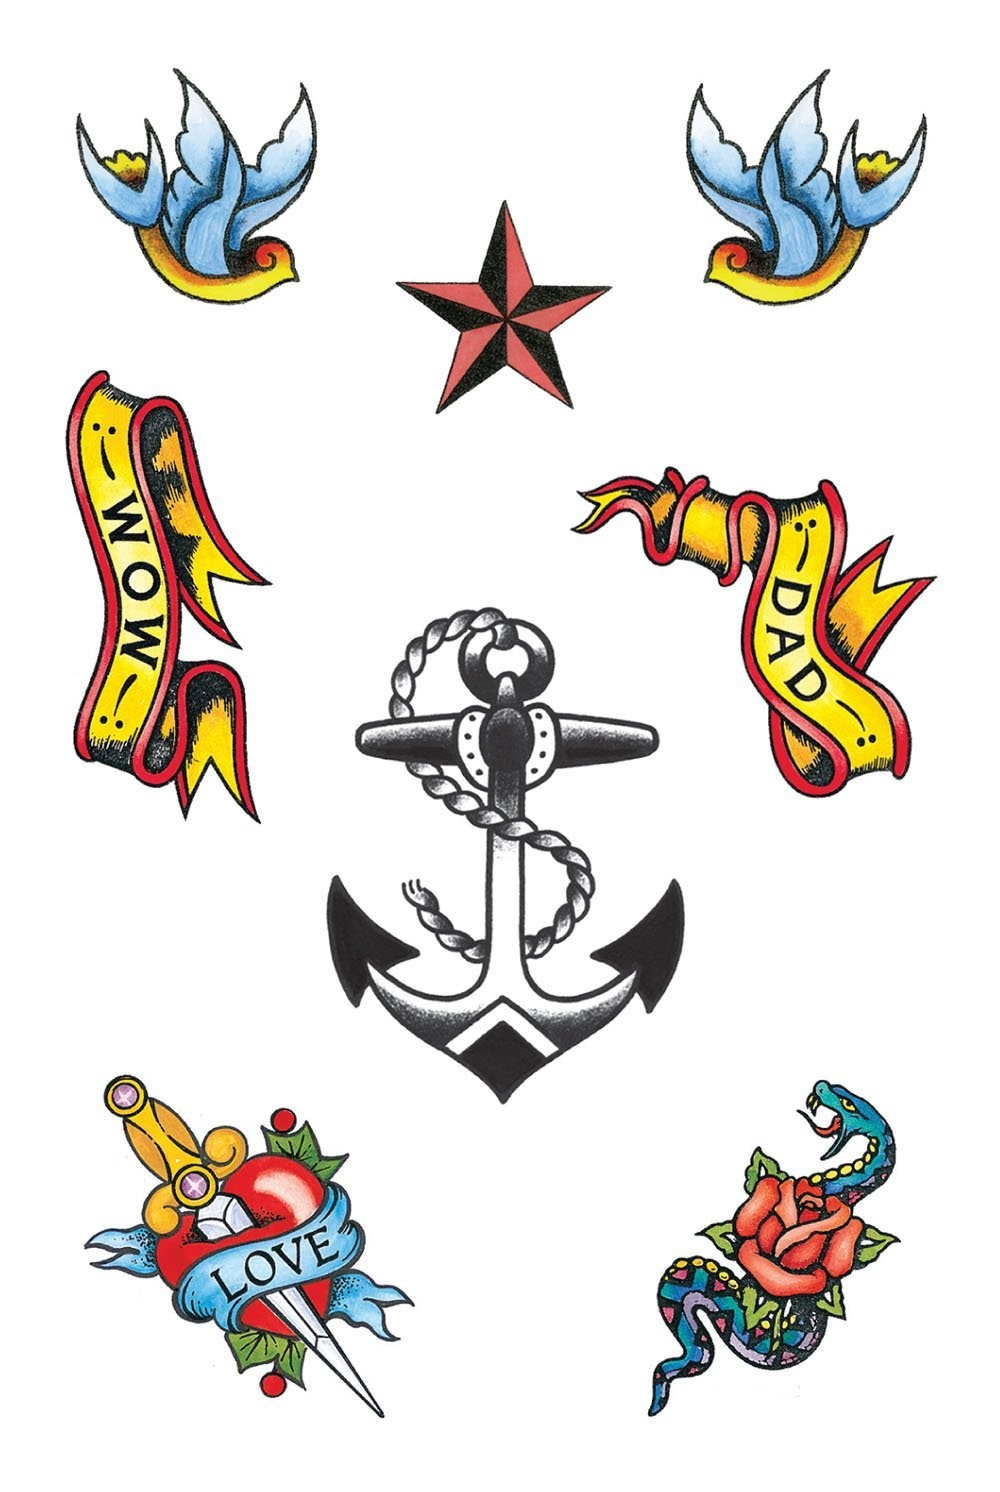 Sailor Theme Tattoos costume Accessory Navy Fancy Dress